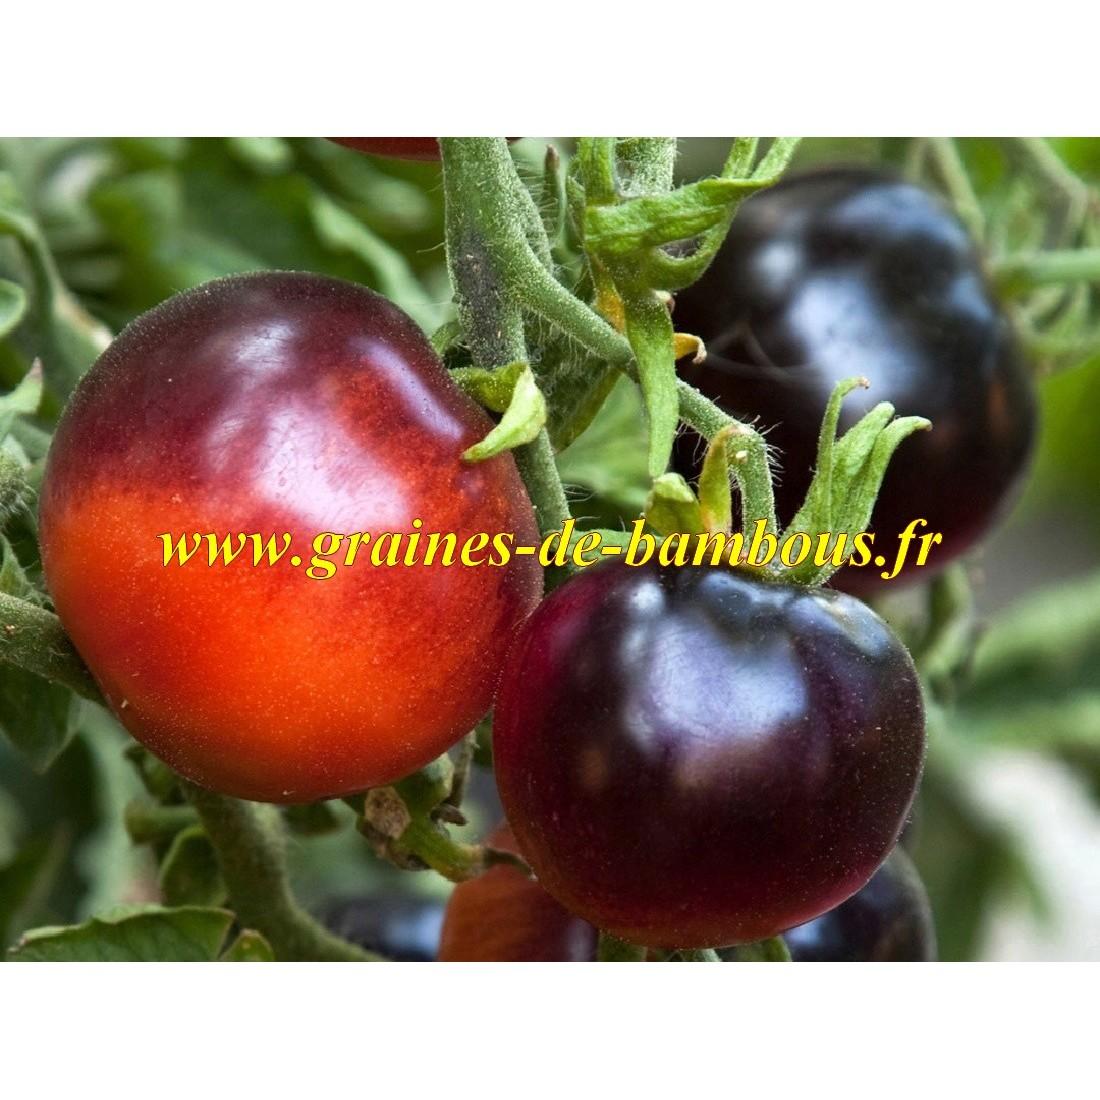 Indigo rose tomato seeds graines de bambous fr